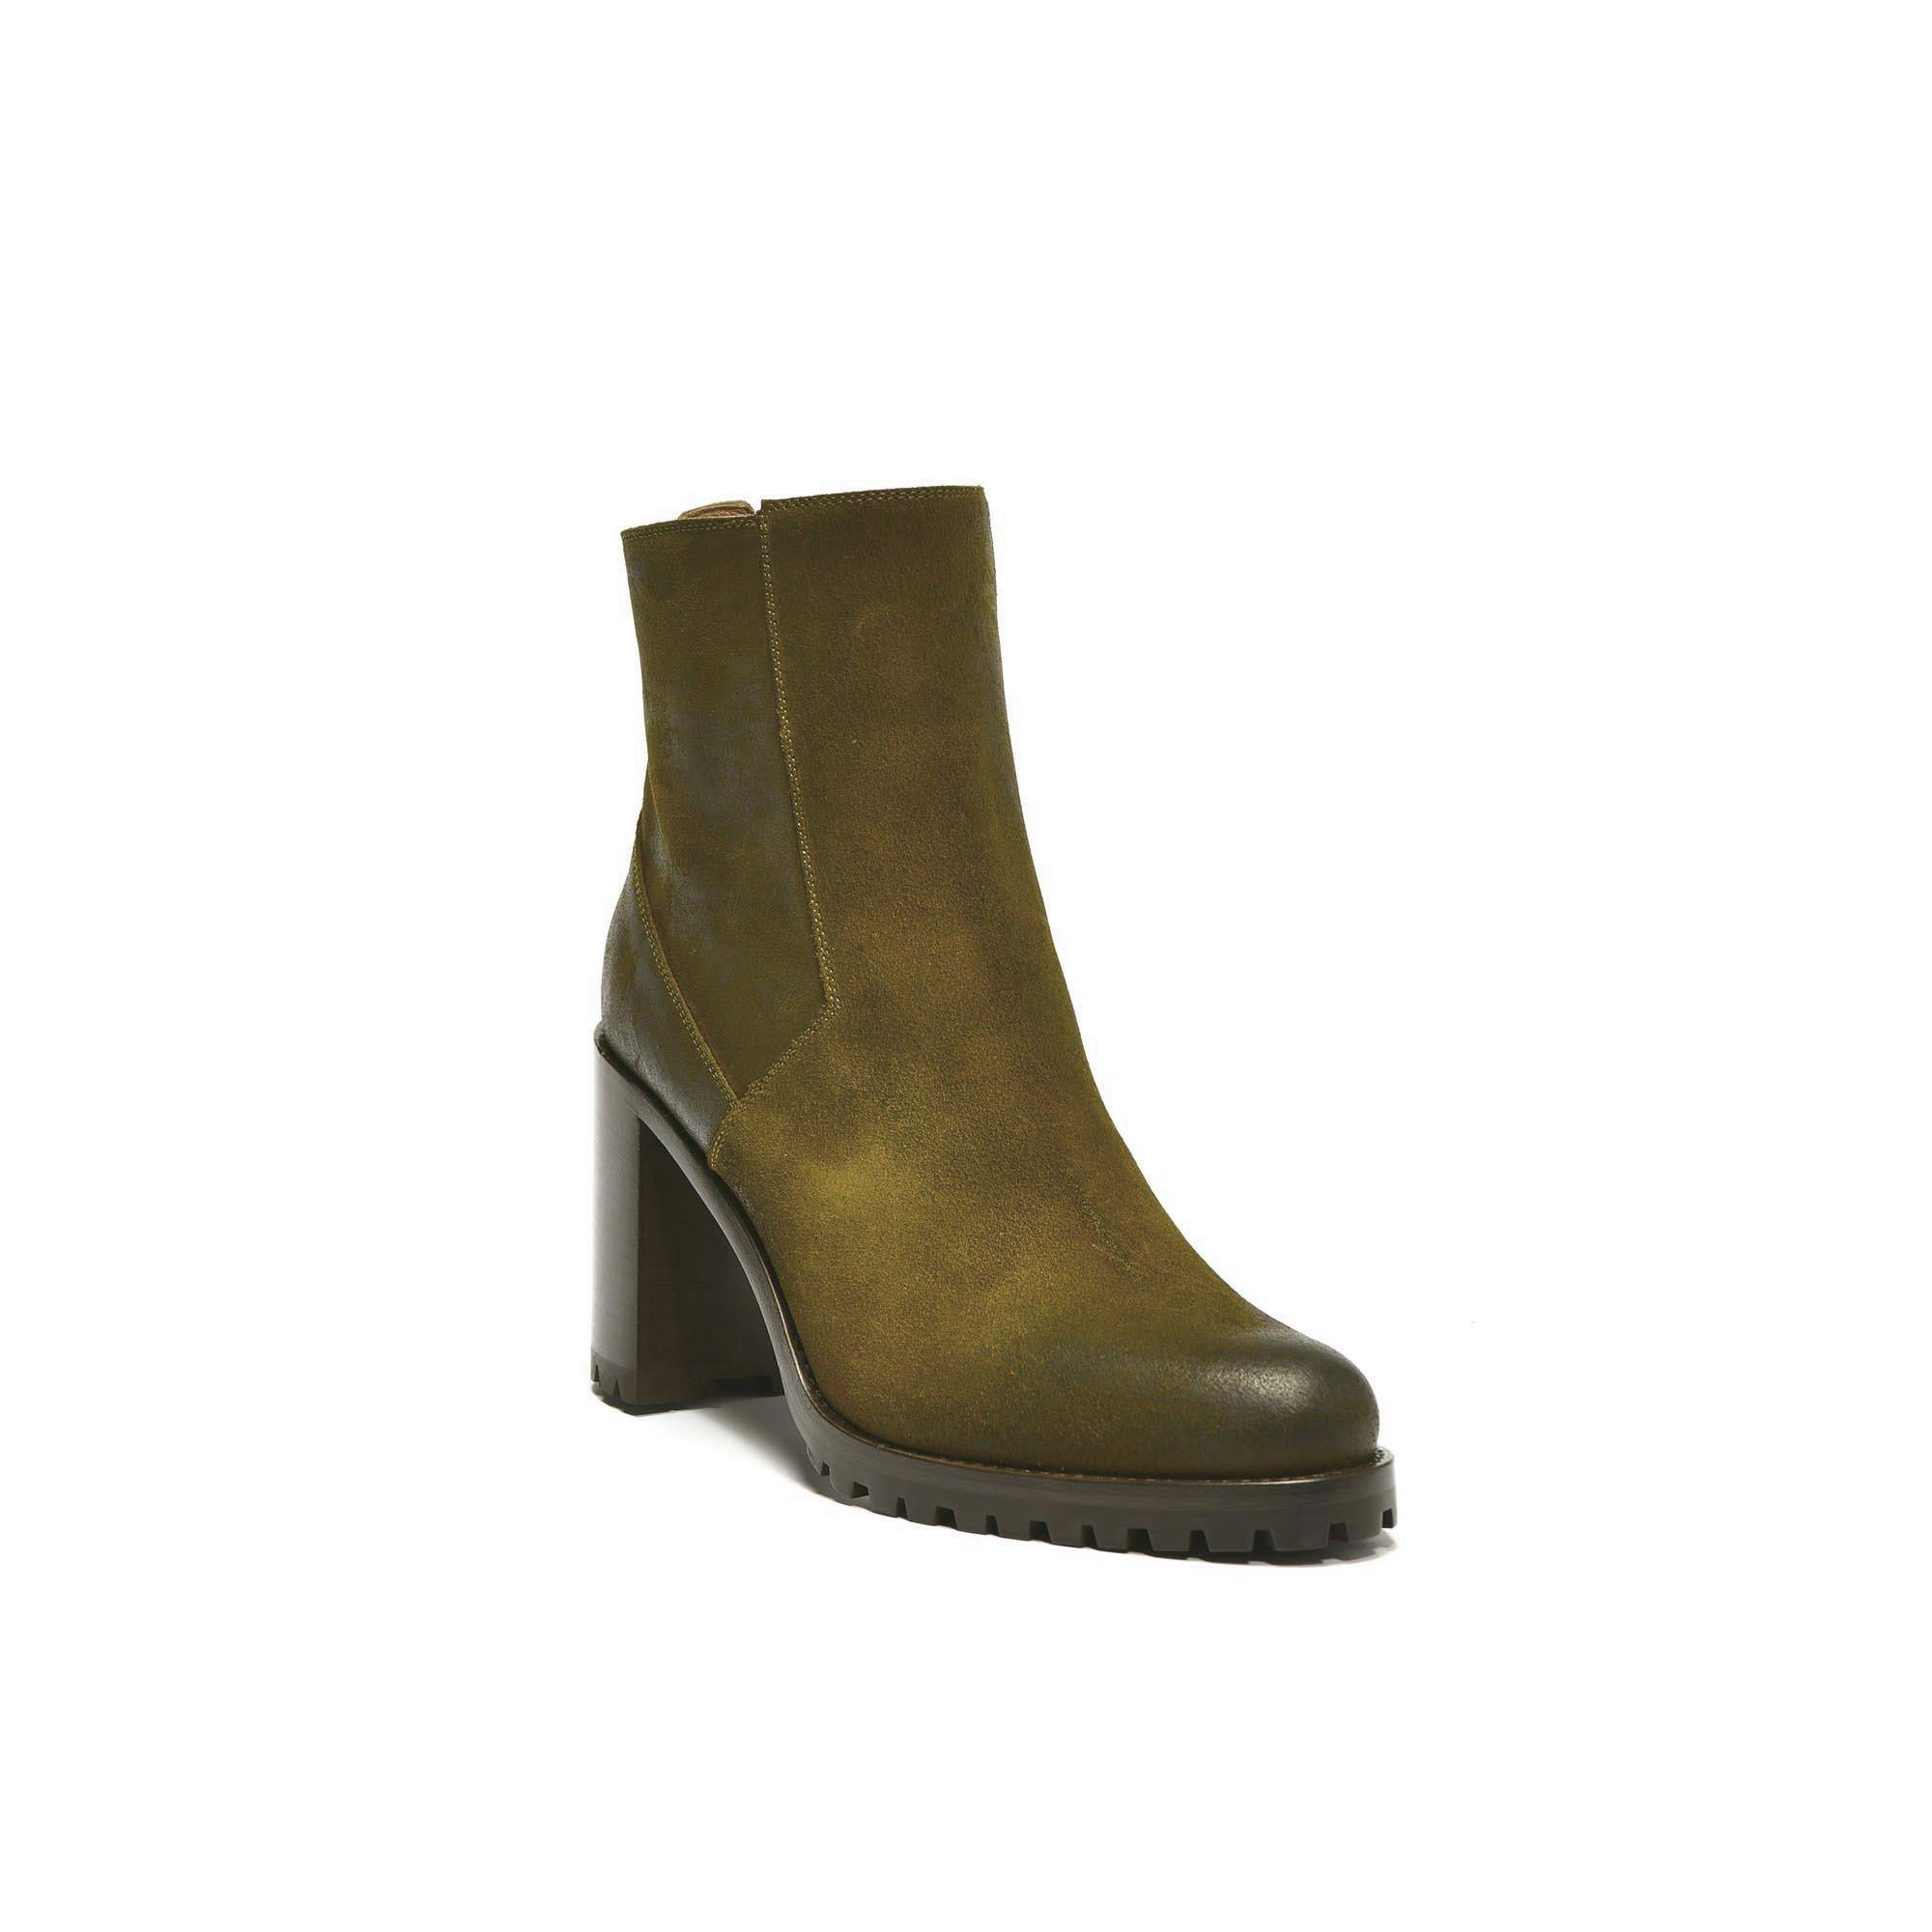 Boots kaki 3442 Sartore